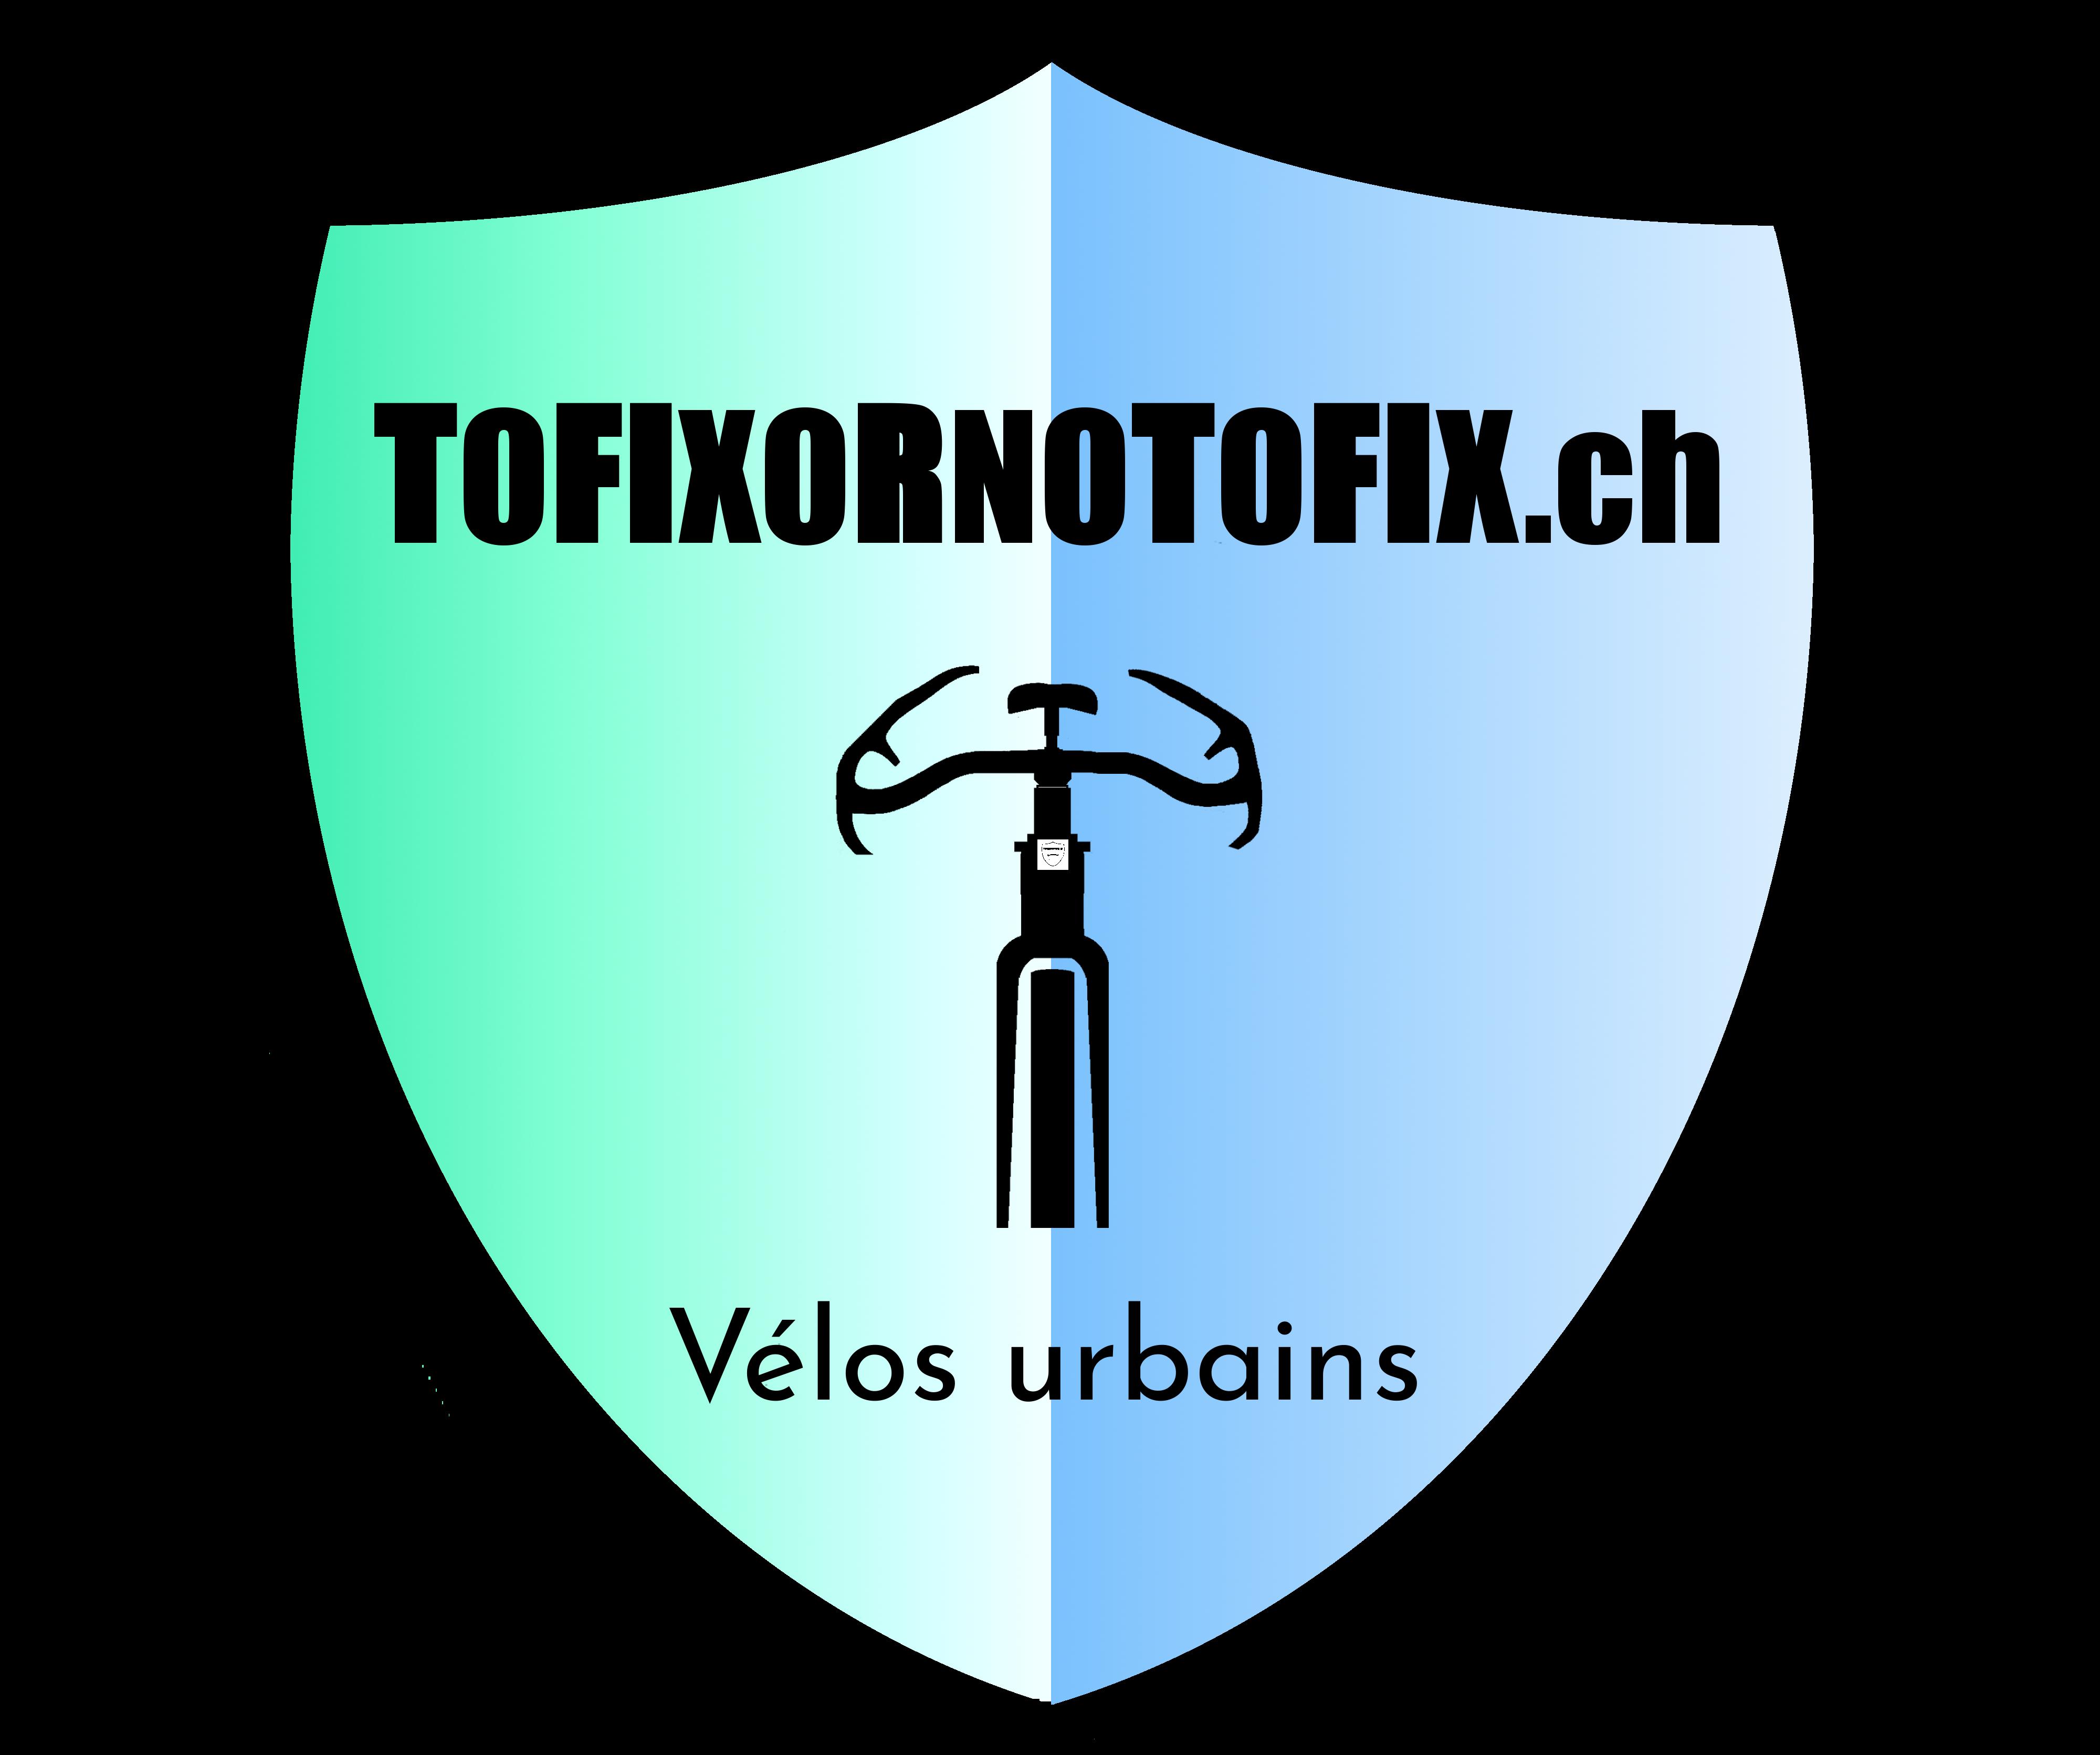 tofixornotofix.ch